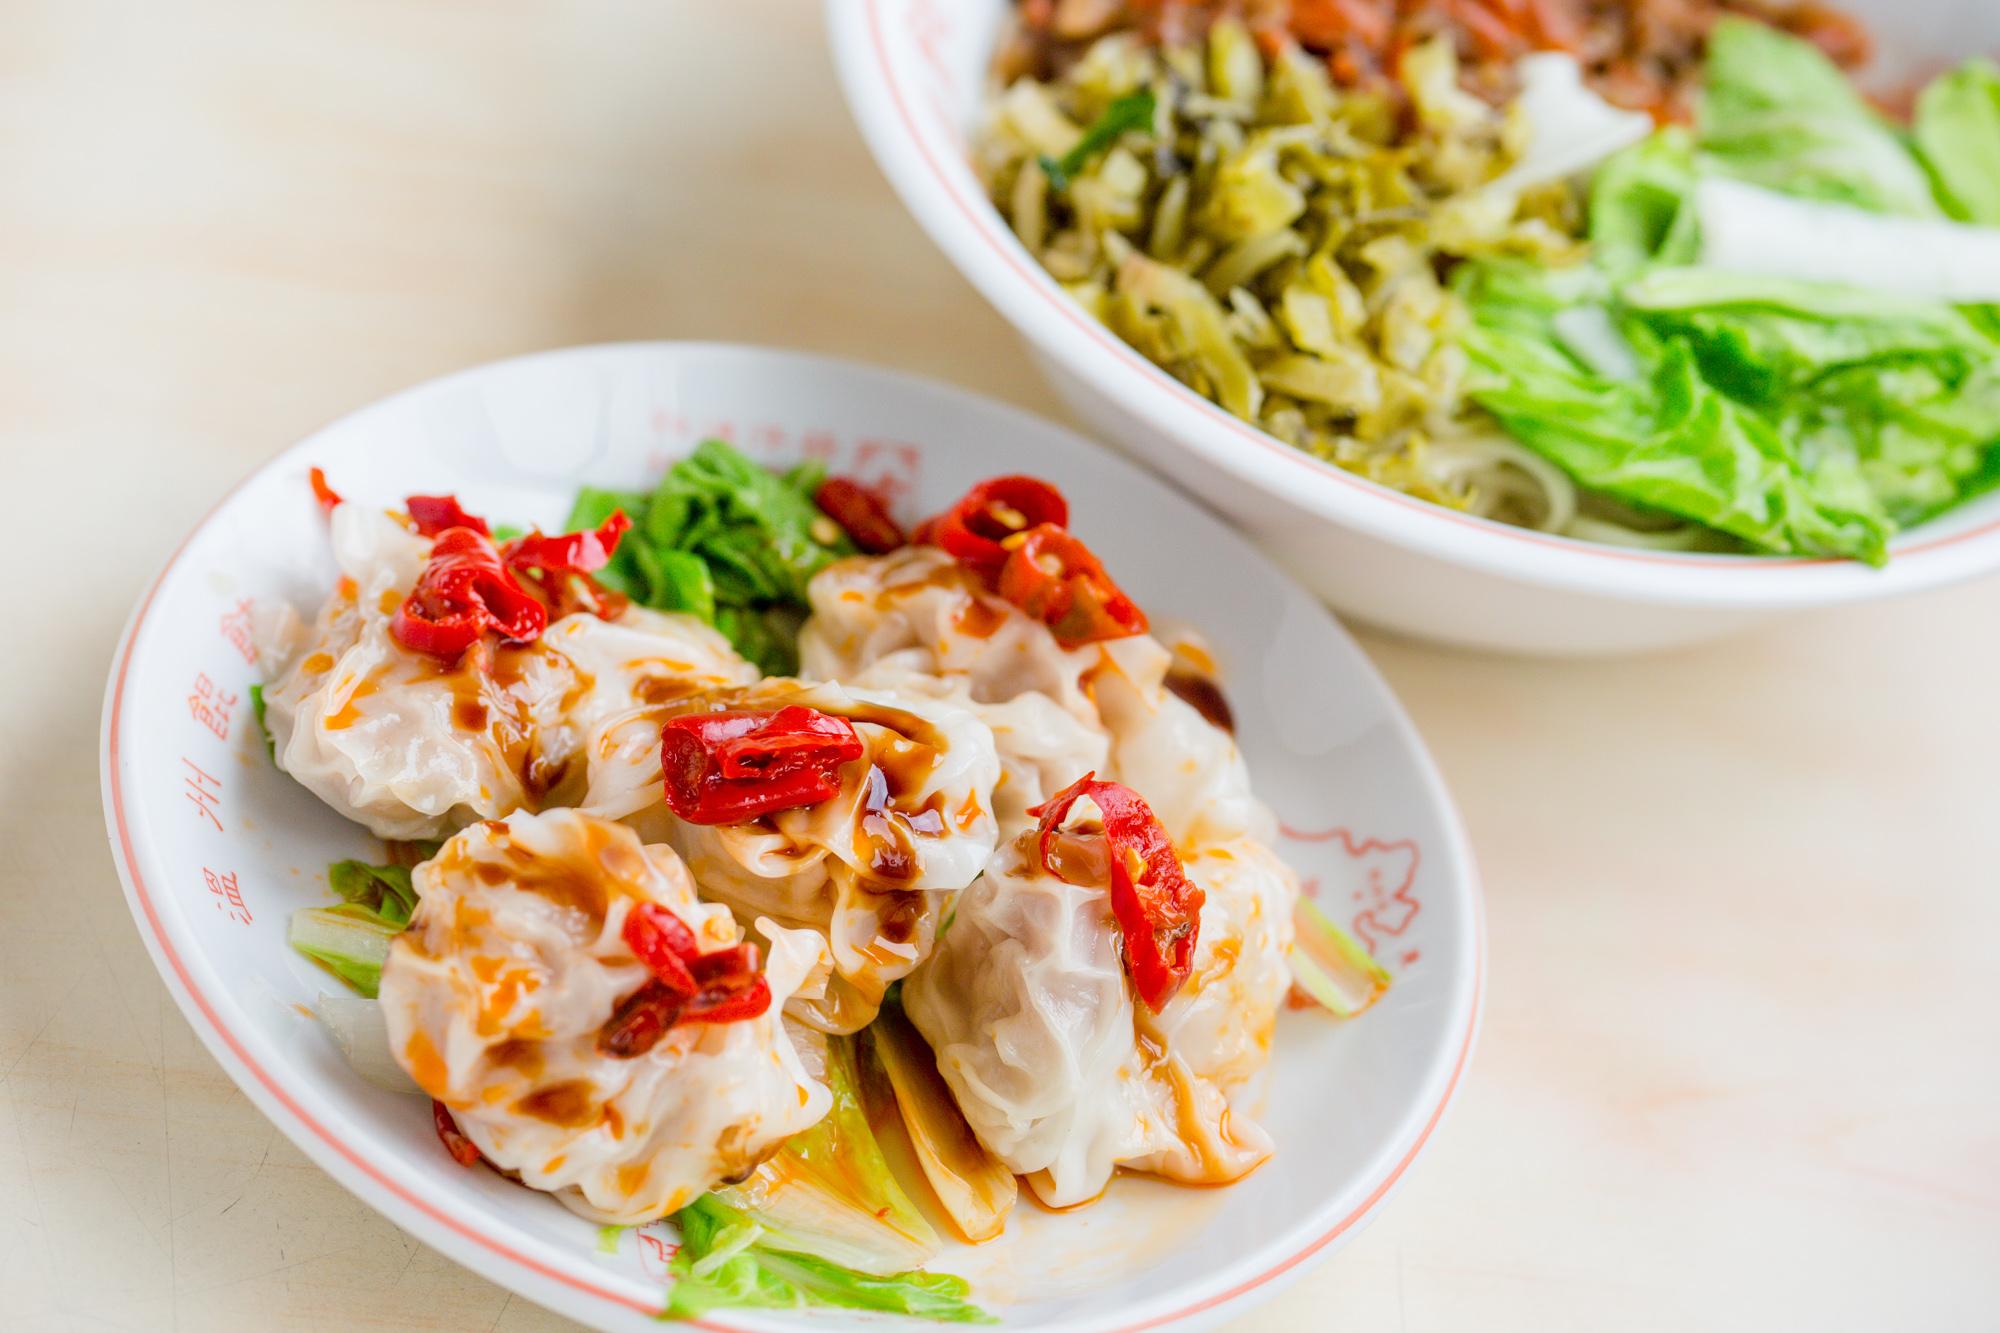 H 餐:紅油抄手 + 肉丁扮麵